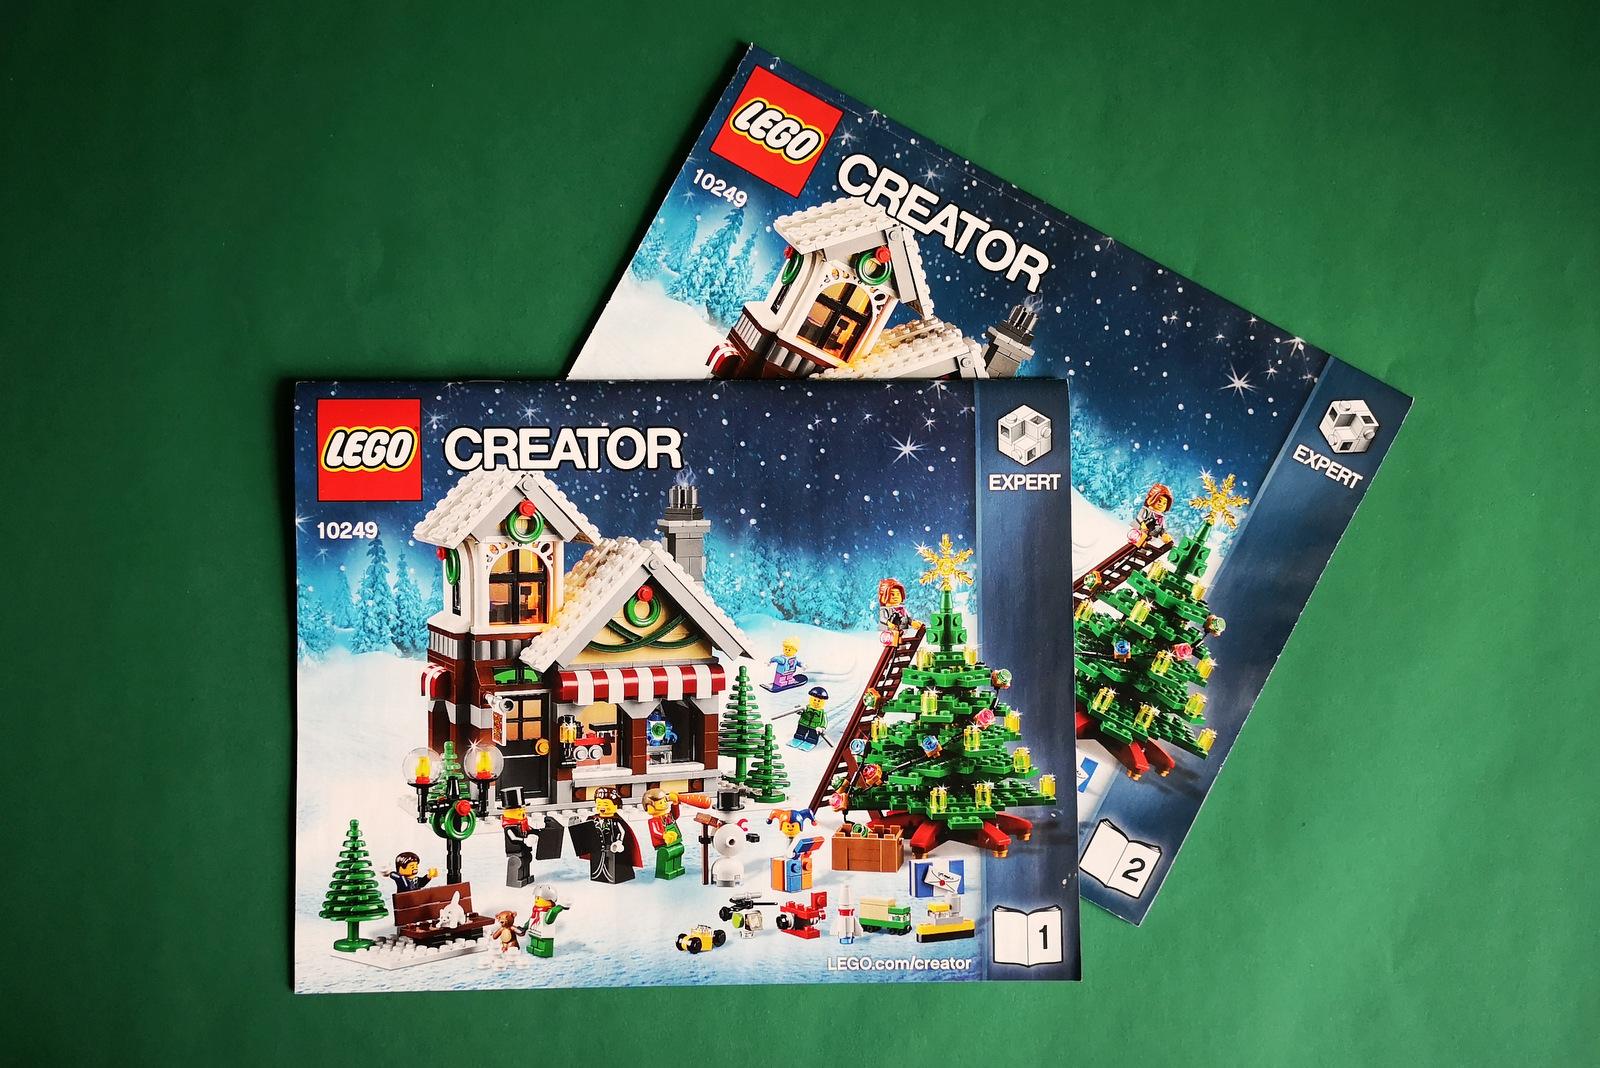 LEGO 10249 Anleitung zum Aufbau